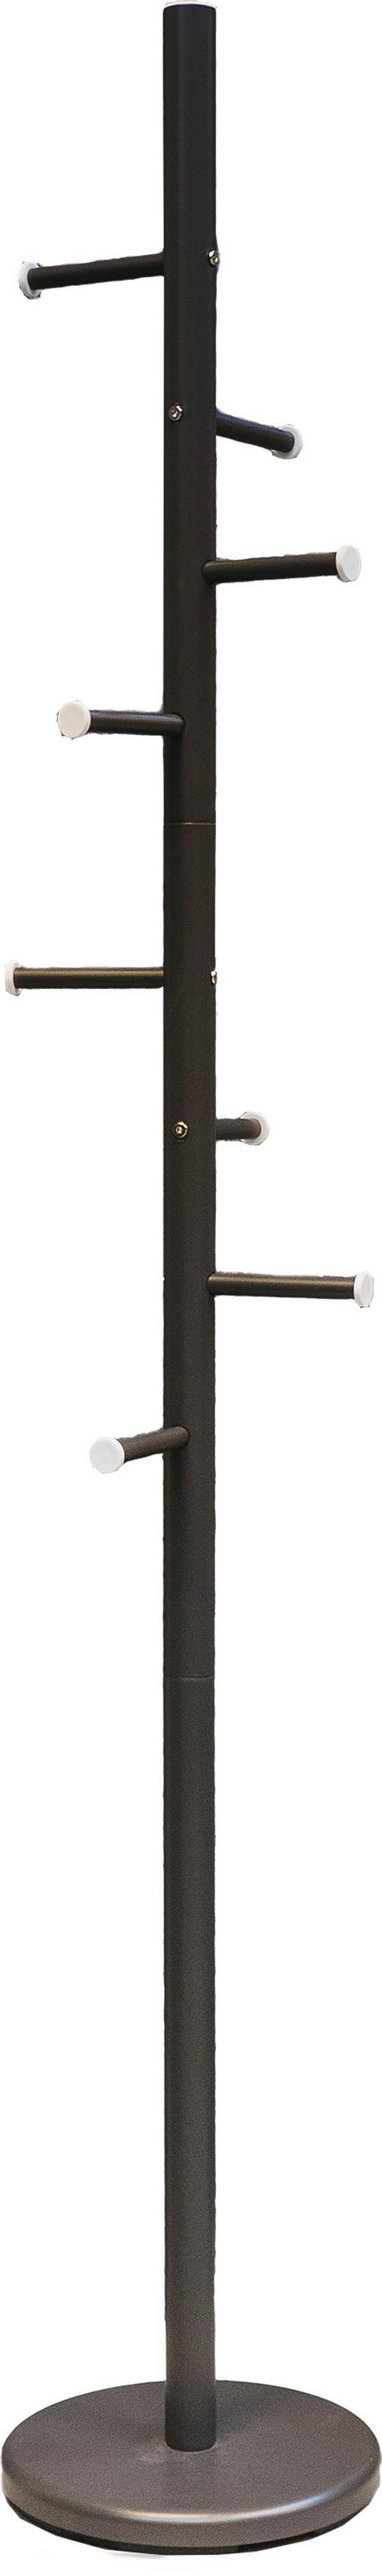 Samostoječ Obešalnik Aguero - antracit, kovina - Mömax modern living